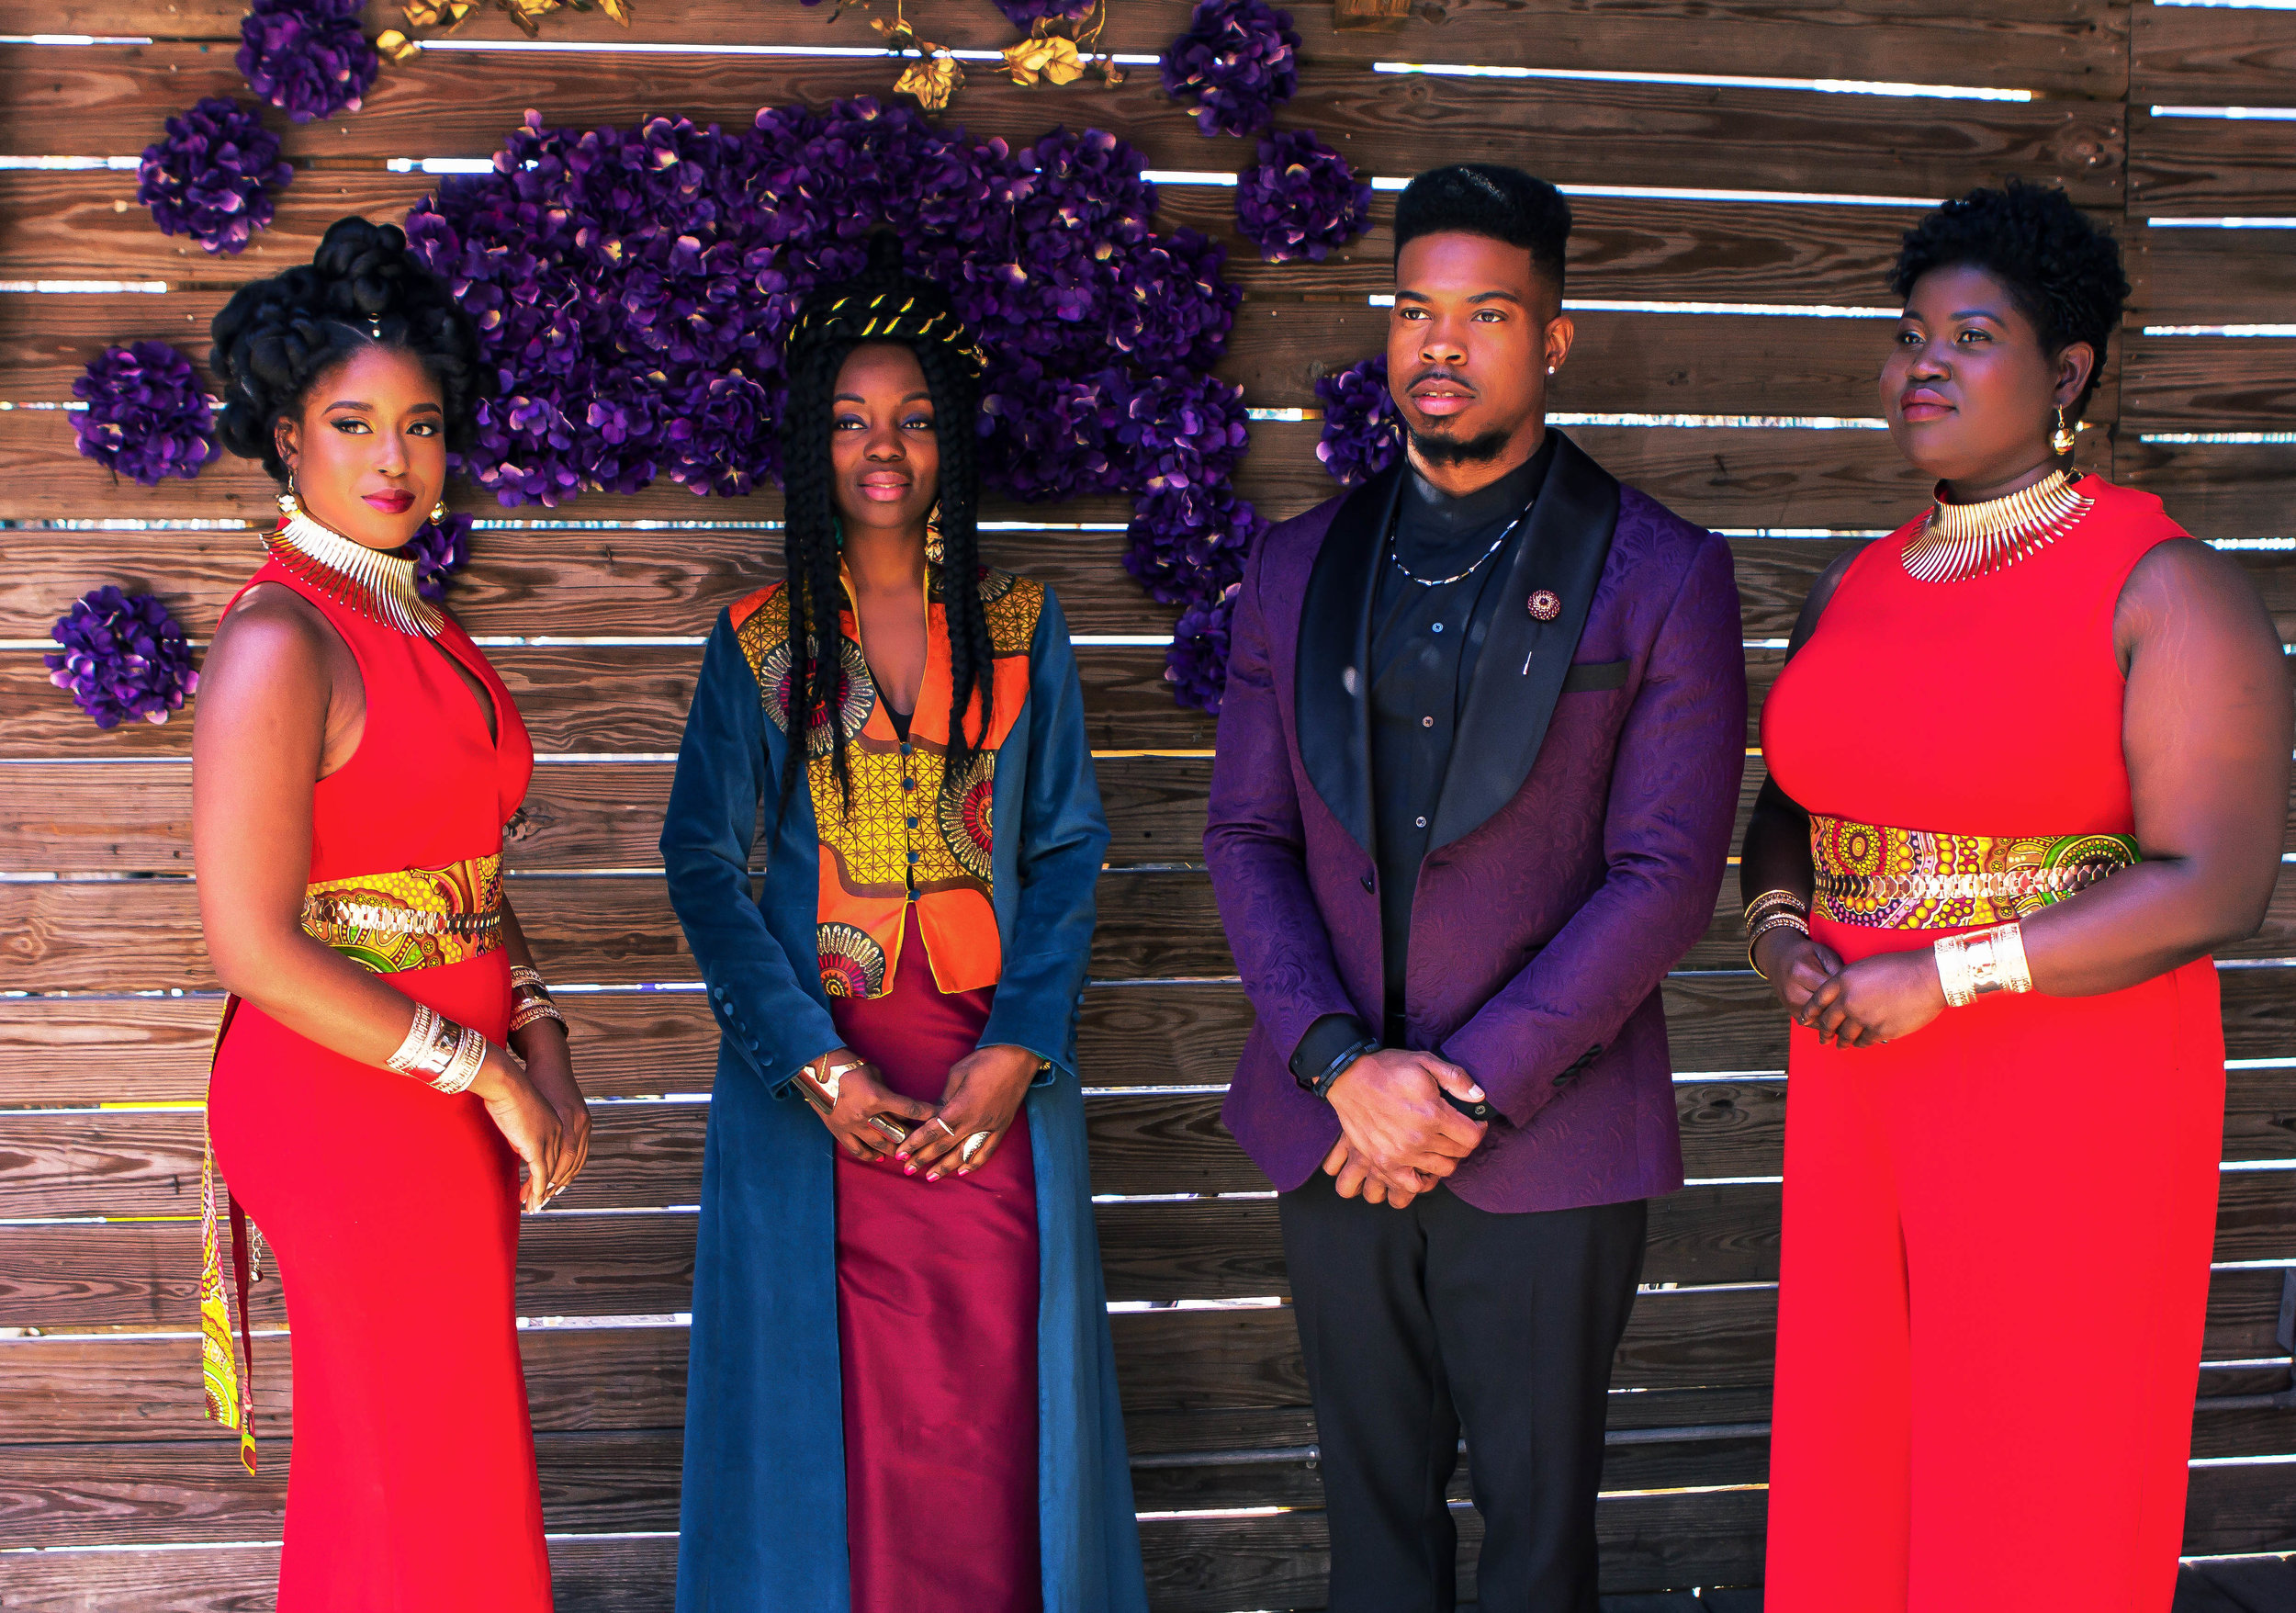 Luxe LeBlanc_Wakandan Wedding_Bridal Party Groom and officiant.jpg